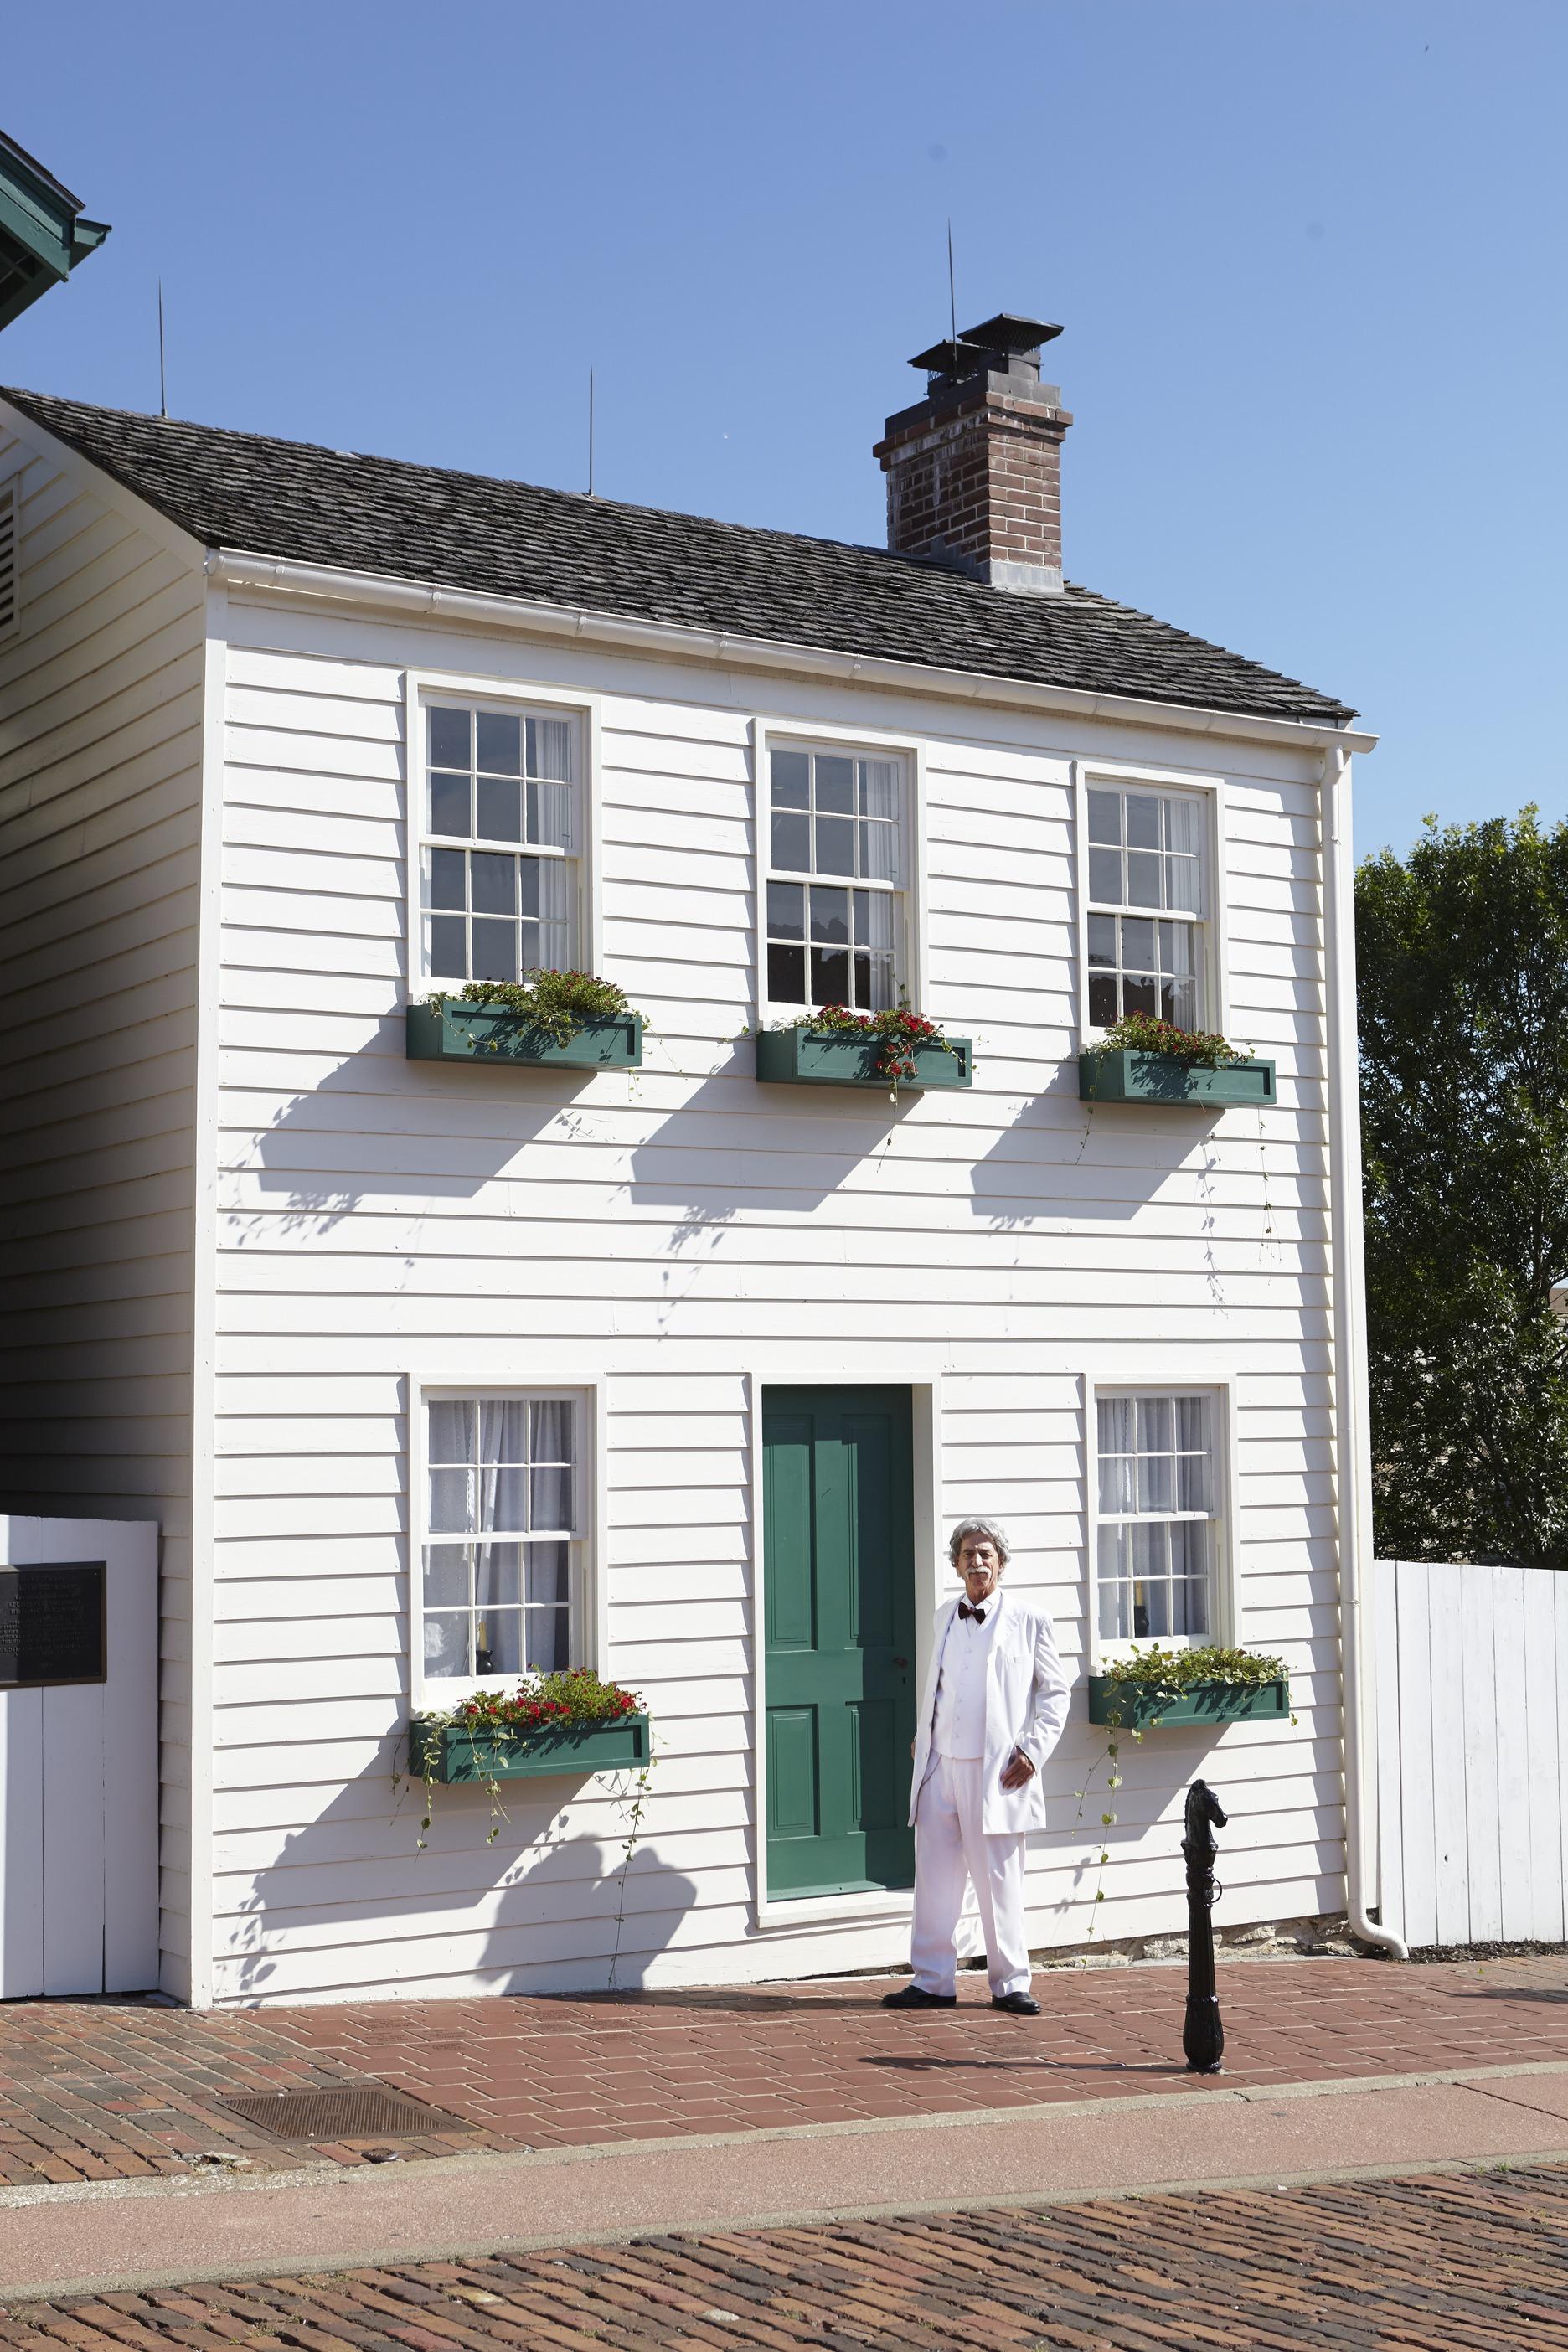 Hannibal, Missouri: Mark Twain Boyhood Home and Museum